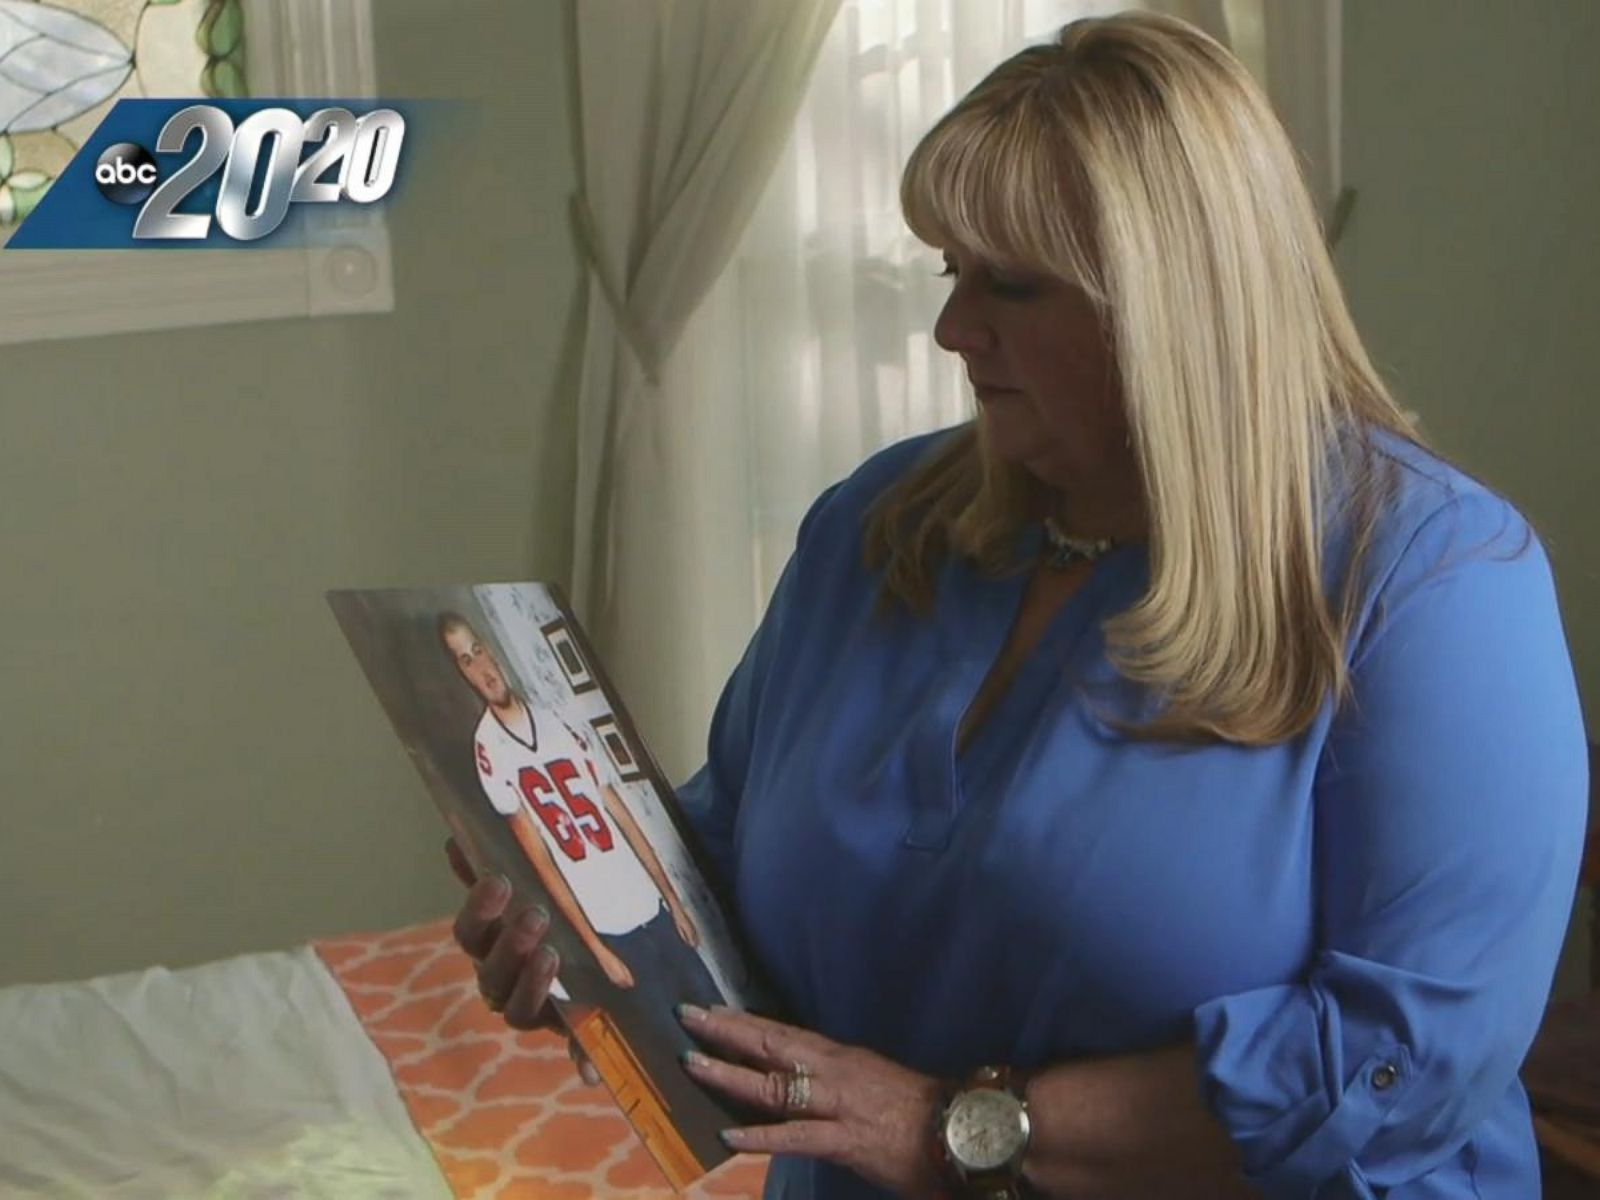 Family Members Describe Losing Kids, Siblings to Heroin Addiction